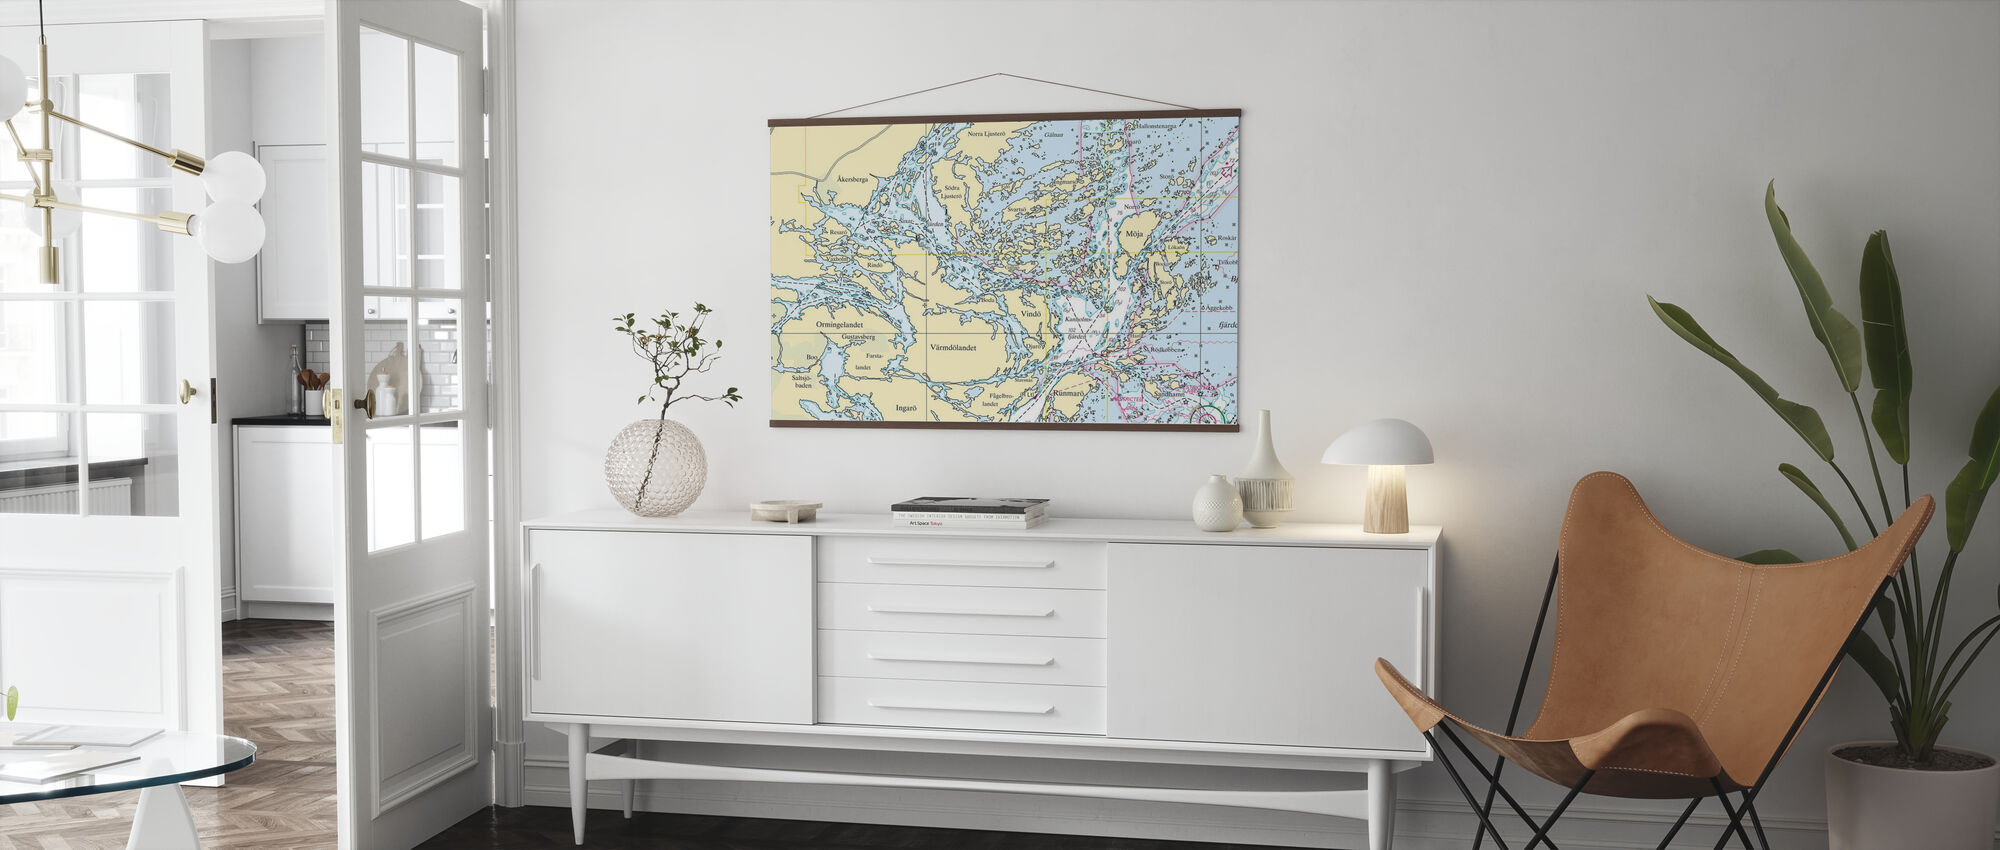 Middle Archipelago - Poster - Living Room